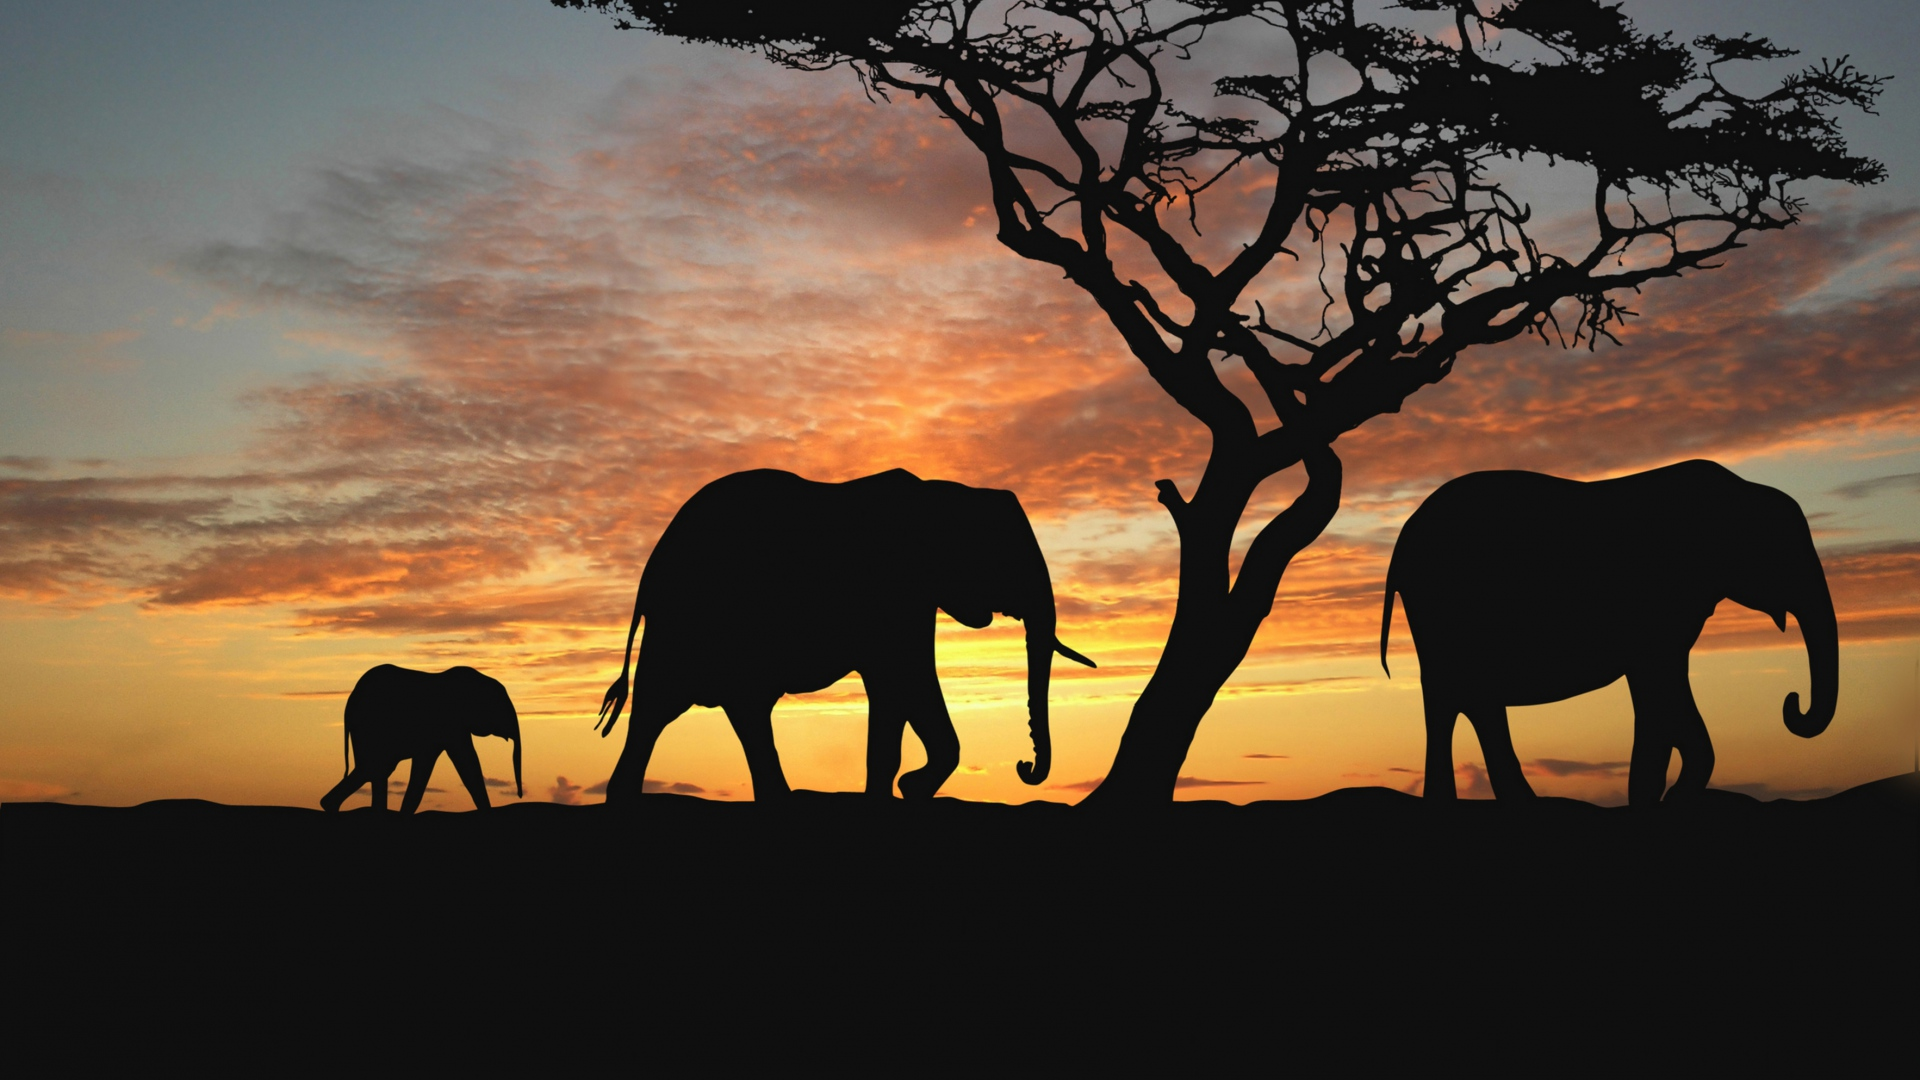 Sunflower Hd Wallpaper 1080p Download Wallpaper 1920x1080 Elephants Cub Silhouette